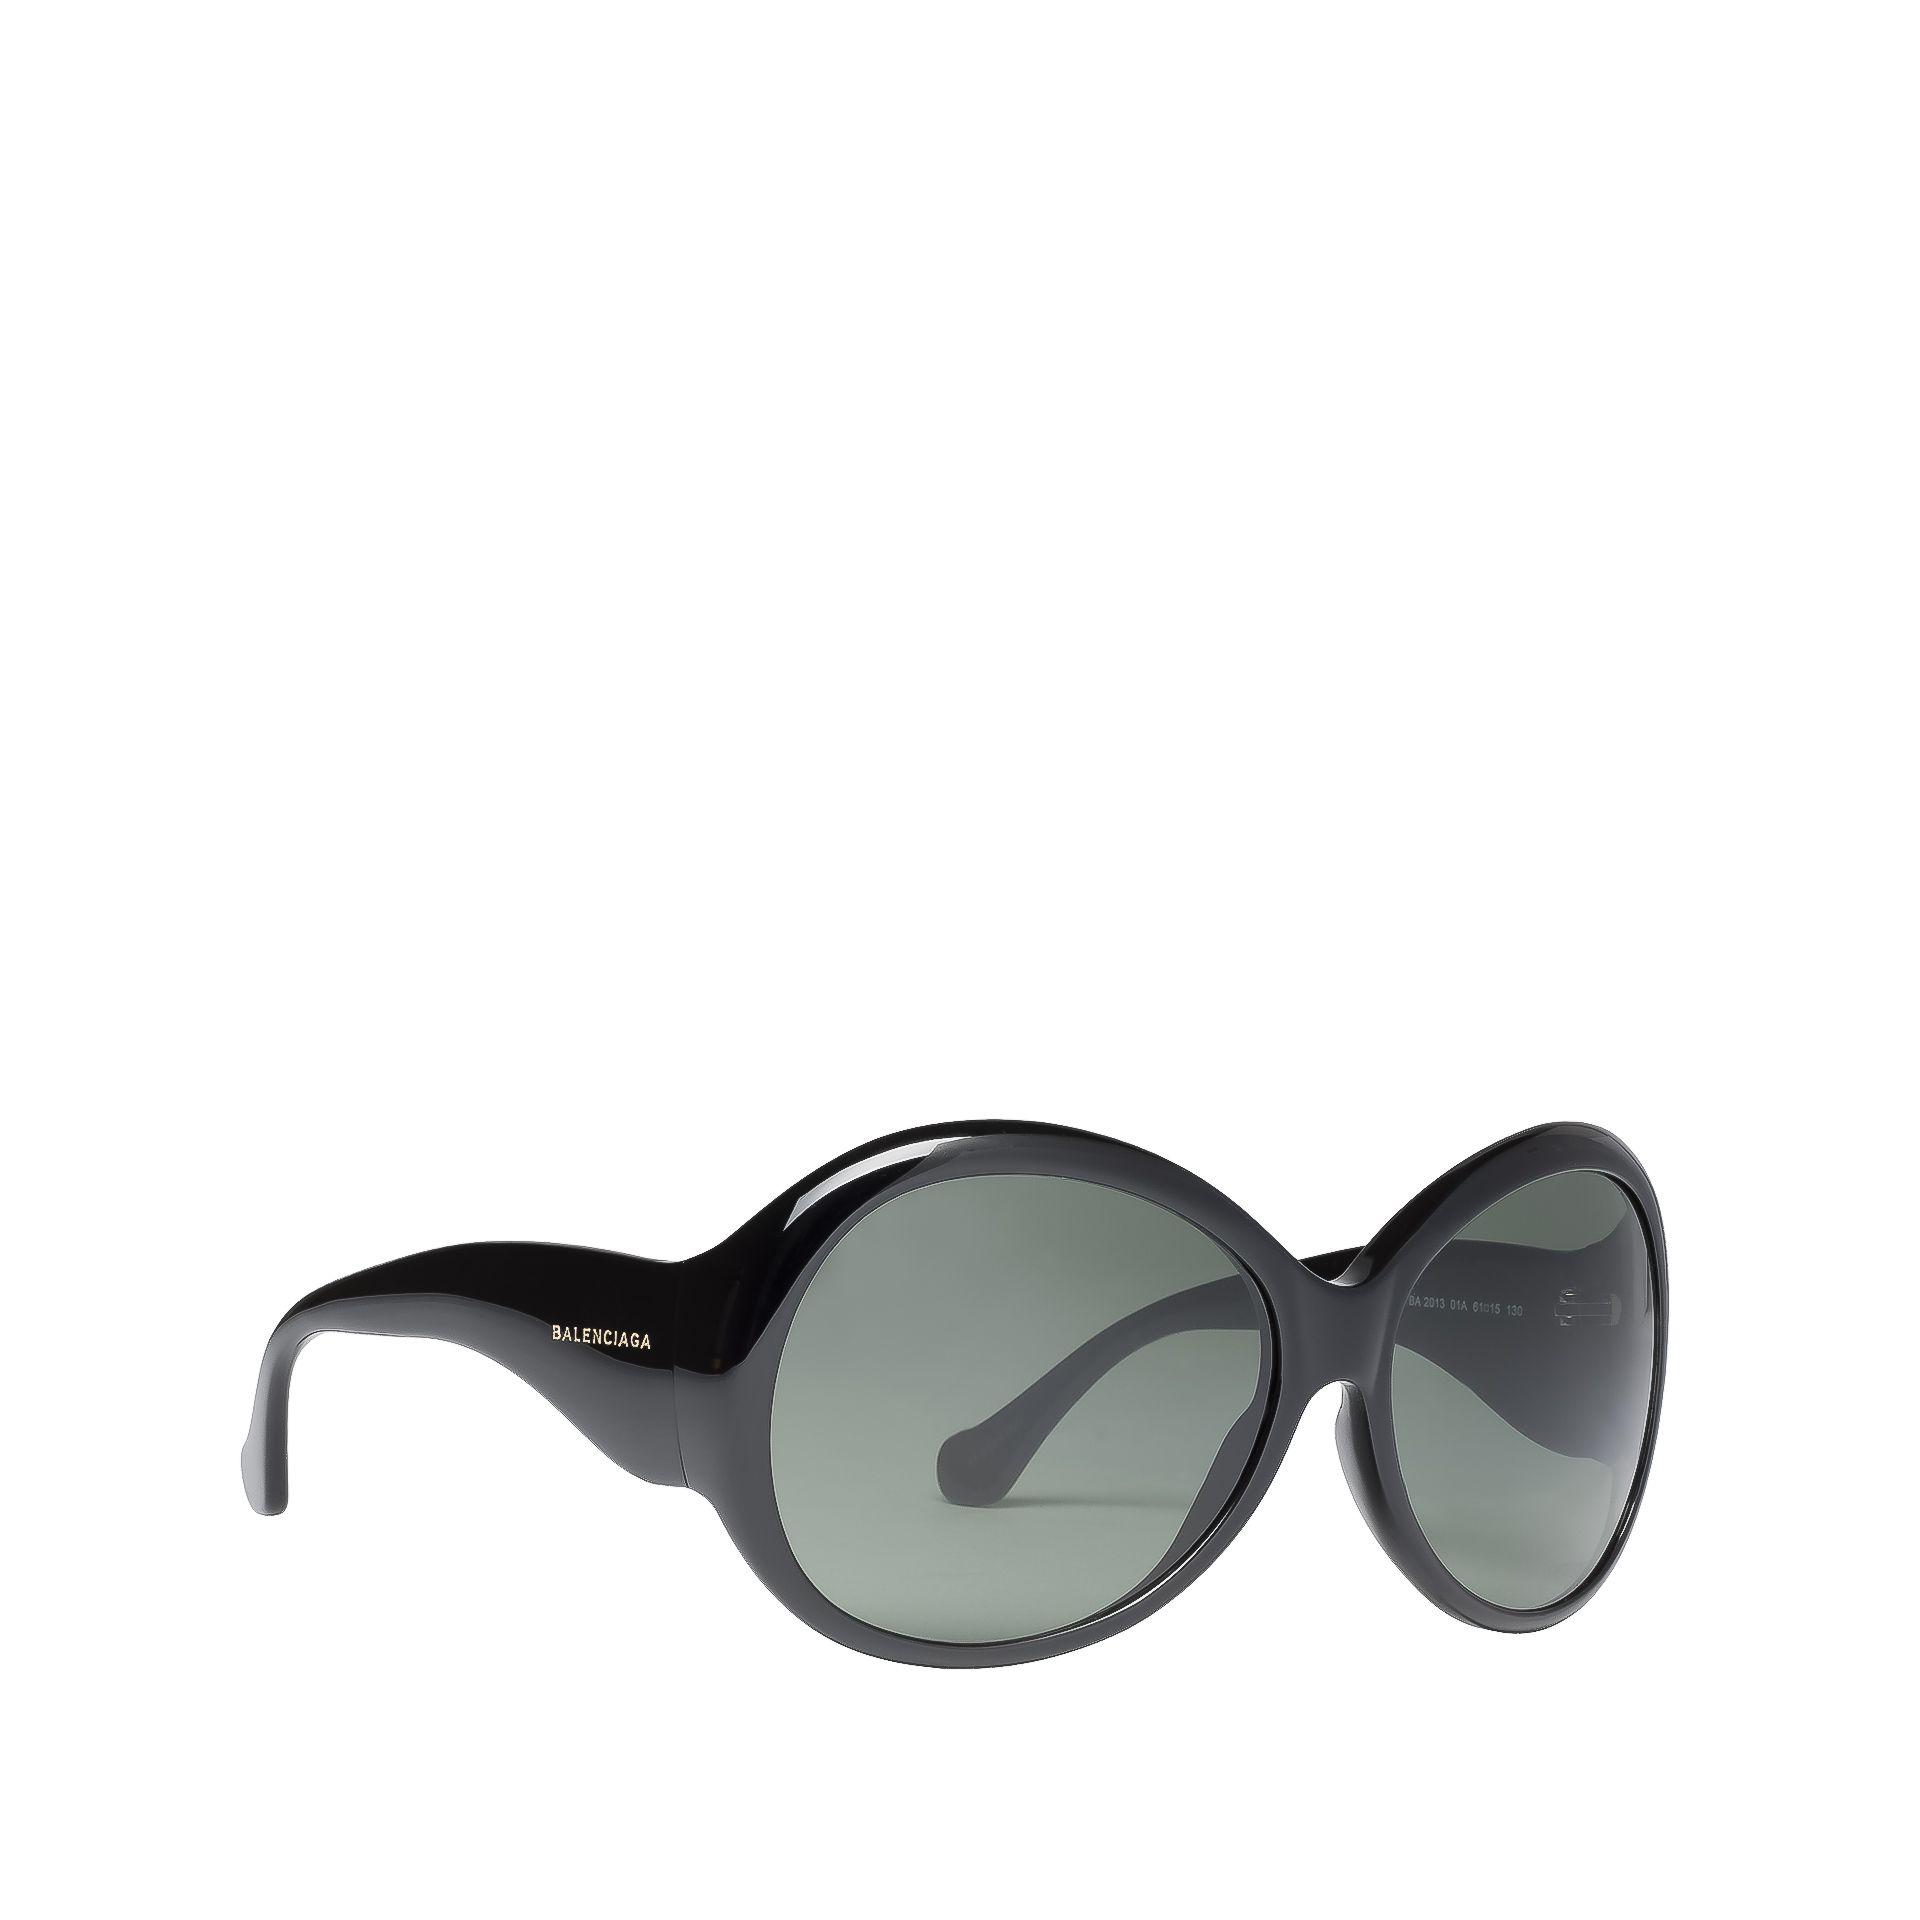 BALENCIAGA Balenciaga Edition Occhiali da Sole Occhiali da sole D f